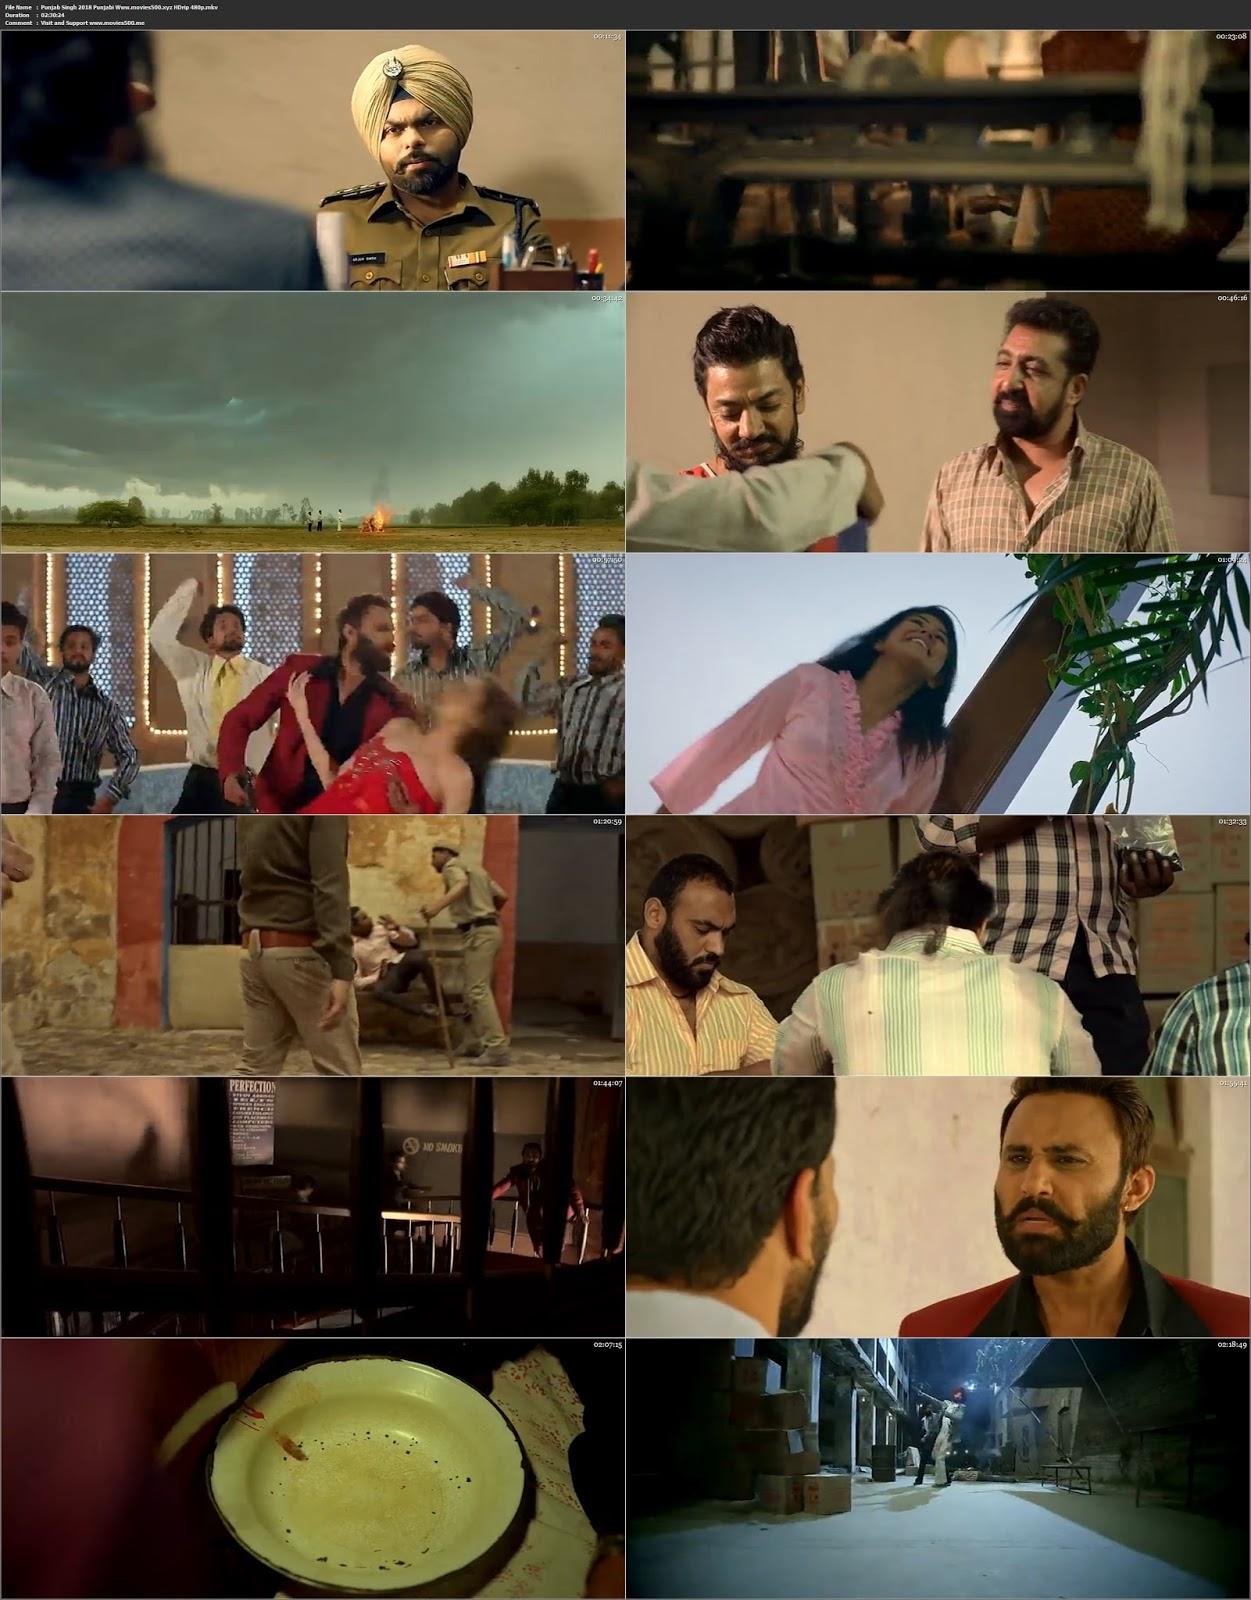 Punjab Singh 2018 Full in 300MB Punjabi Movie HDrip 480p at 9966132.com